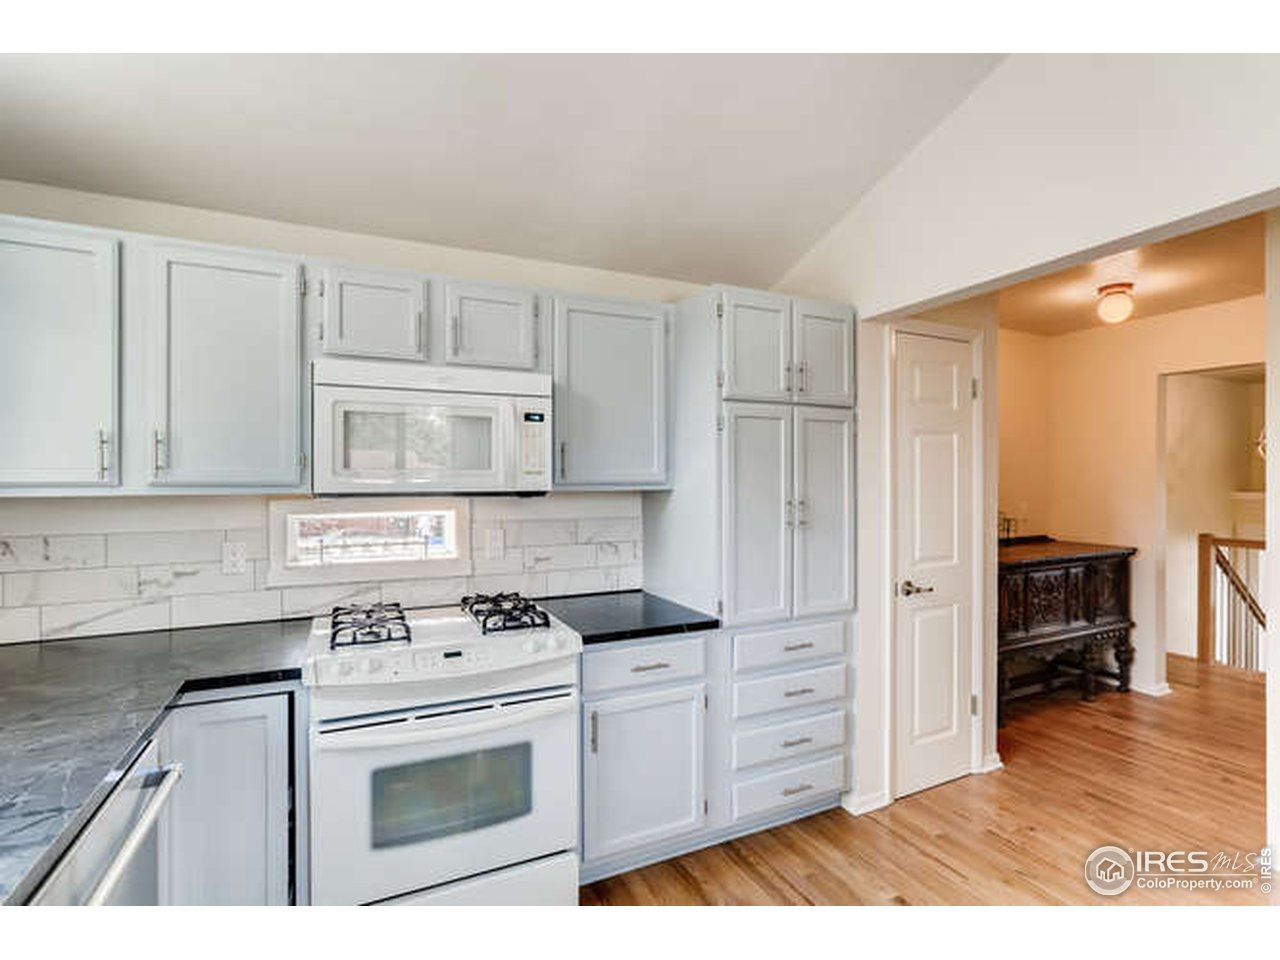 Kitchen + Pantry Room